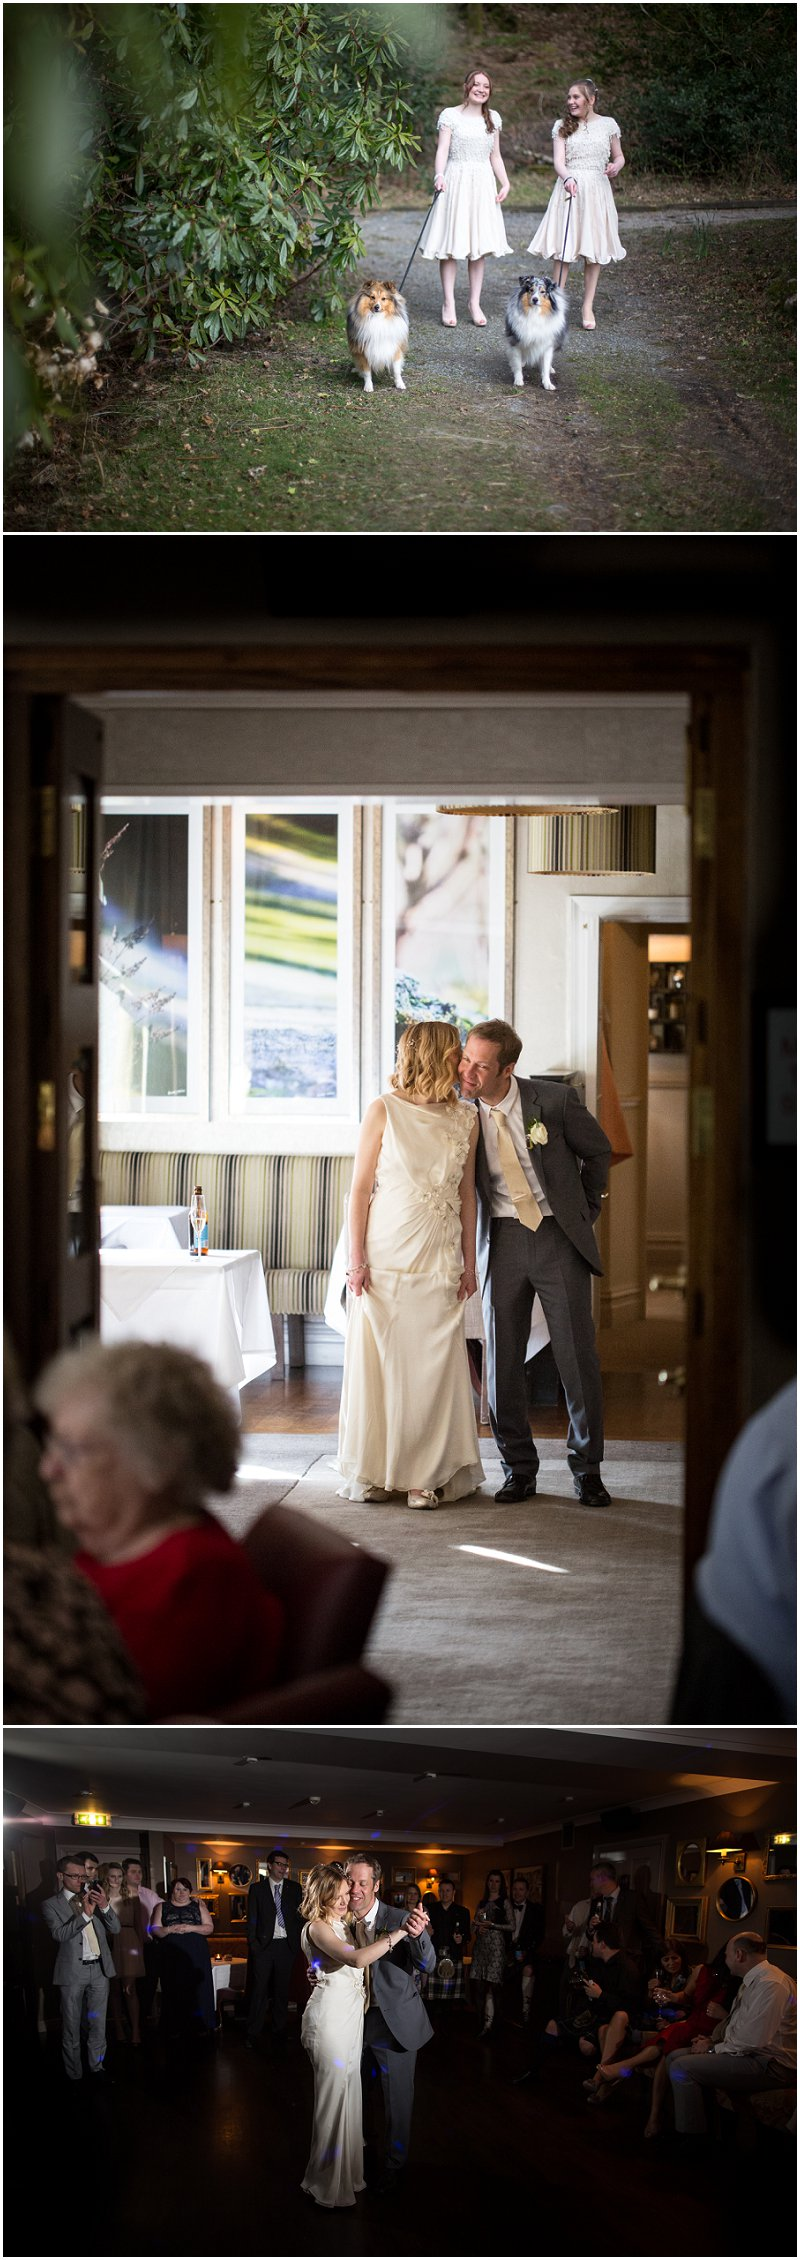 Wedding Sneak Peek Photographs at Linthwaite House Hotel